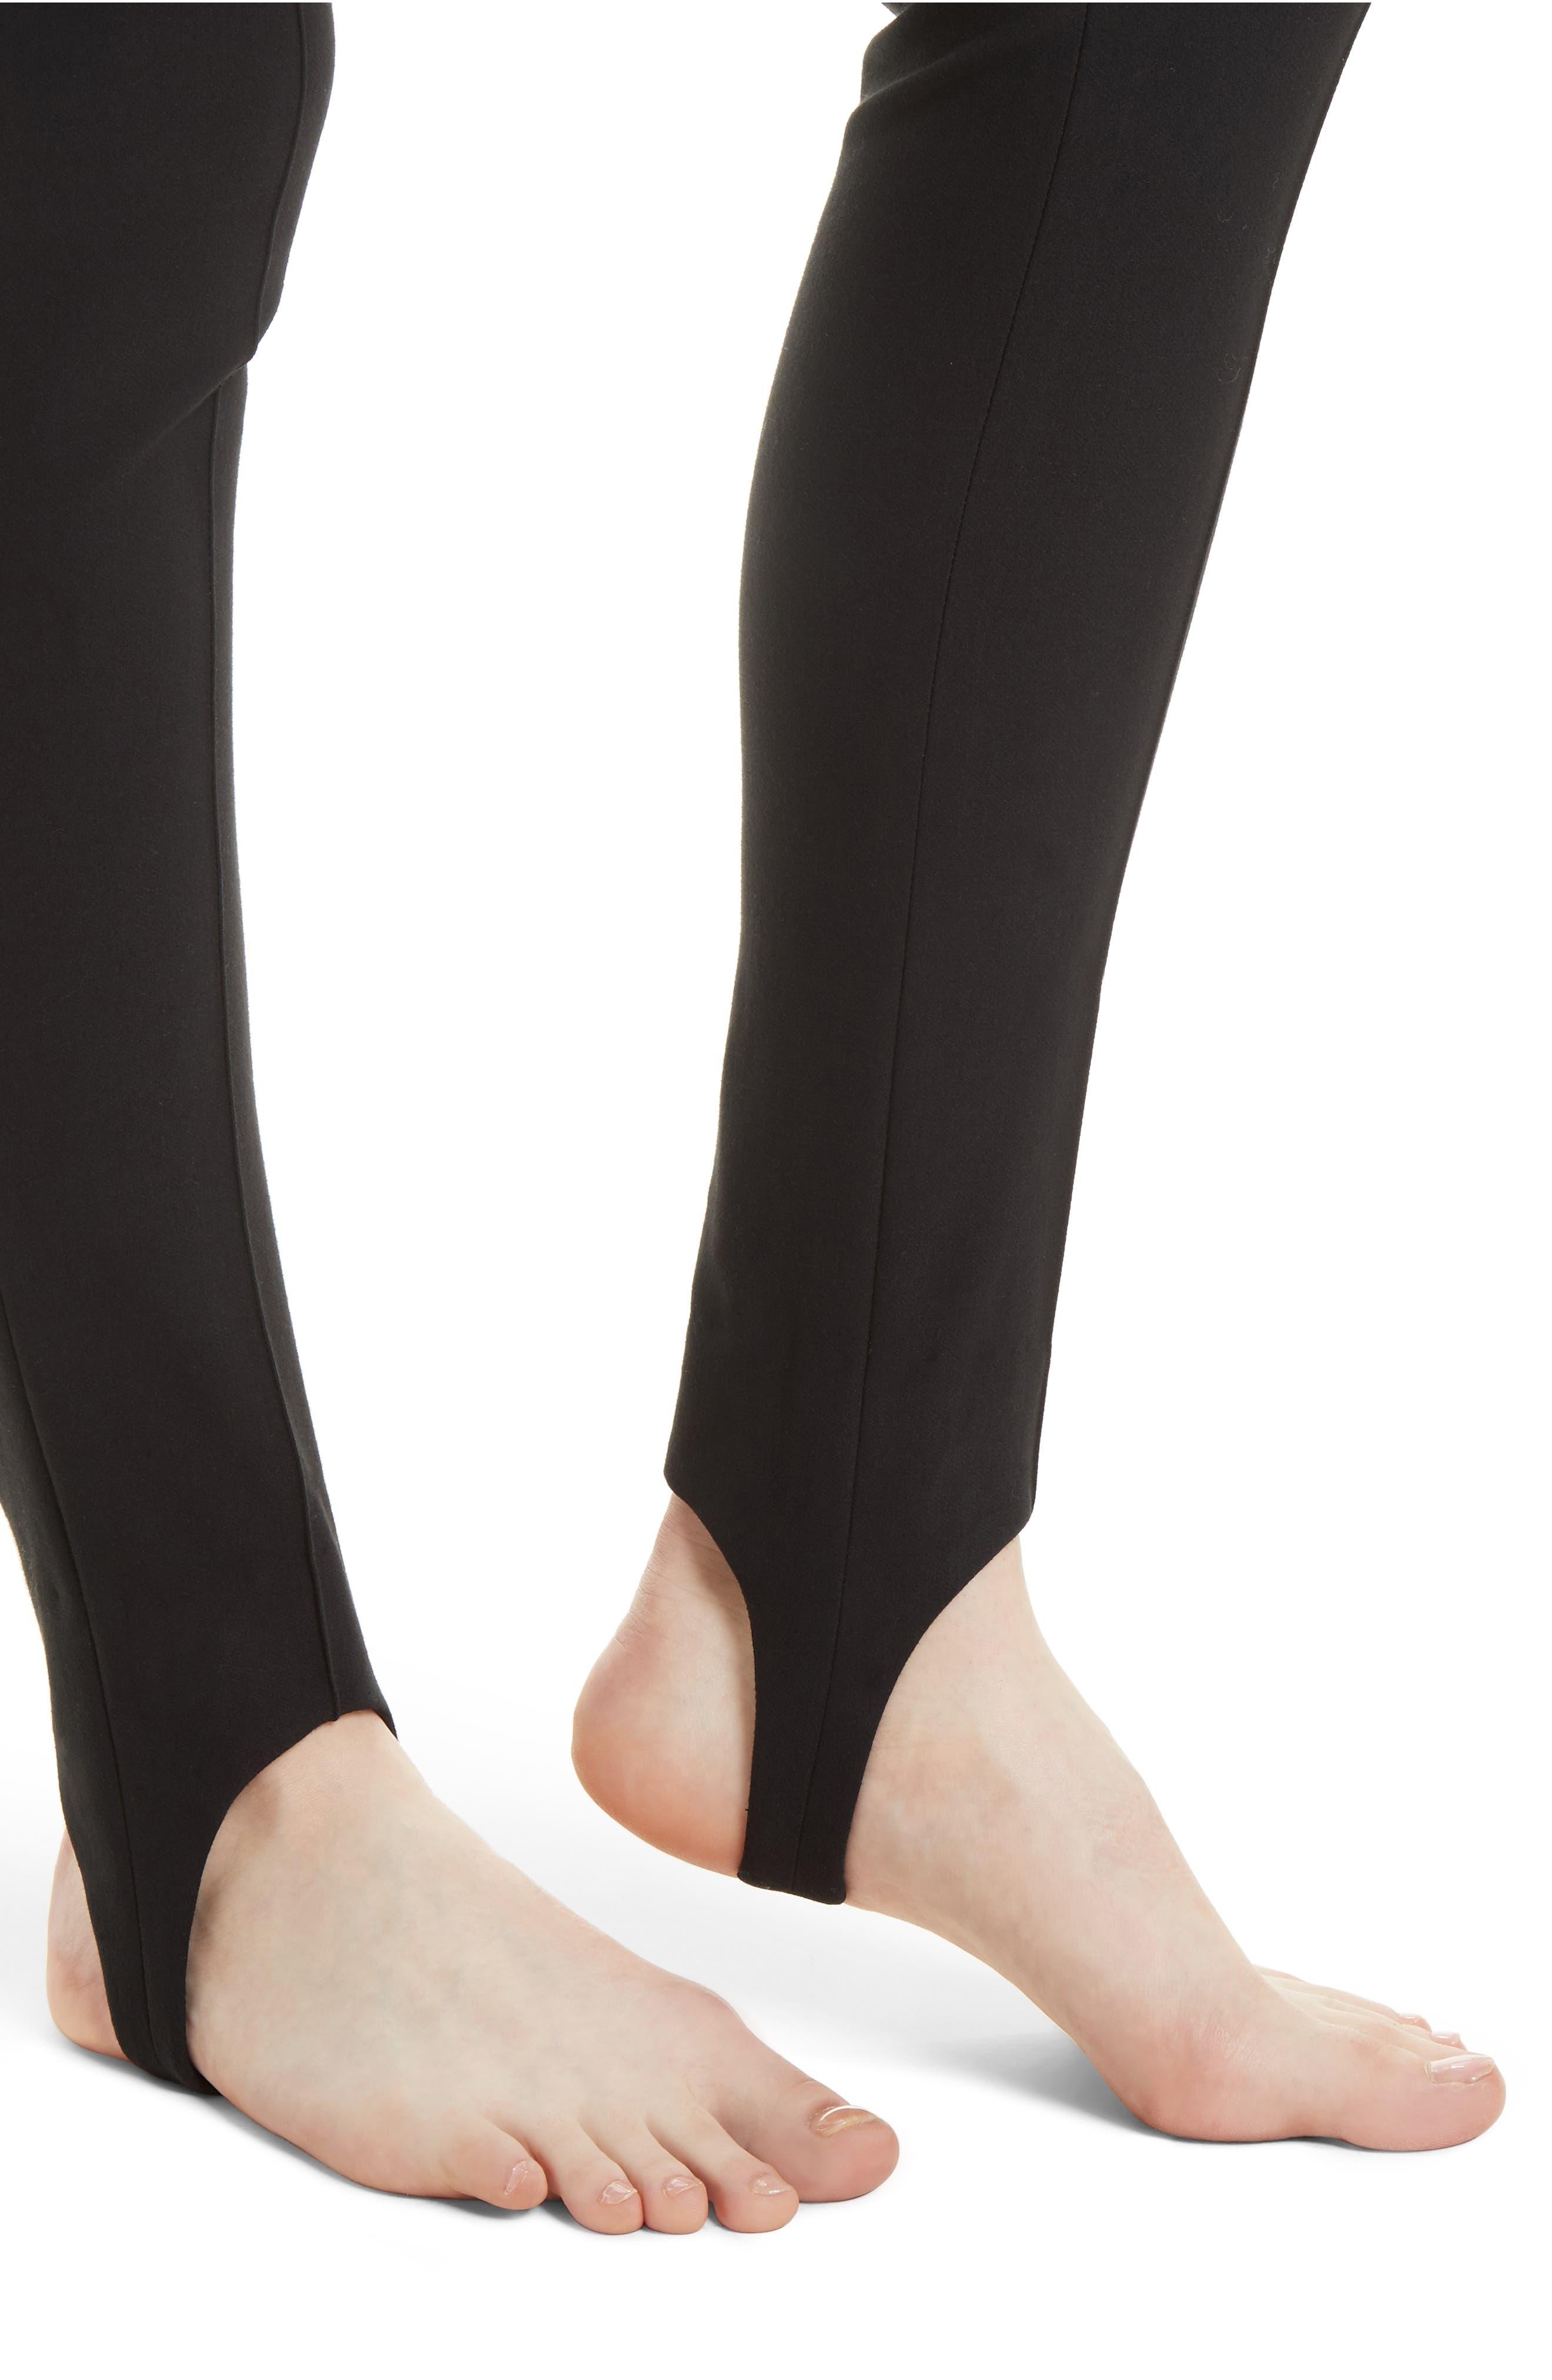 Stirrup Leggings,                             Alternate thumbnail 4, color,                             001